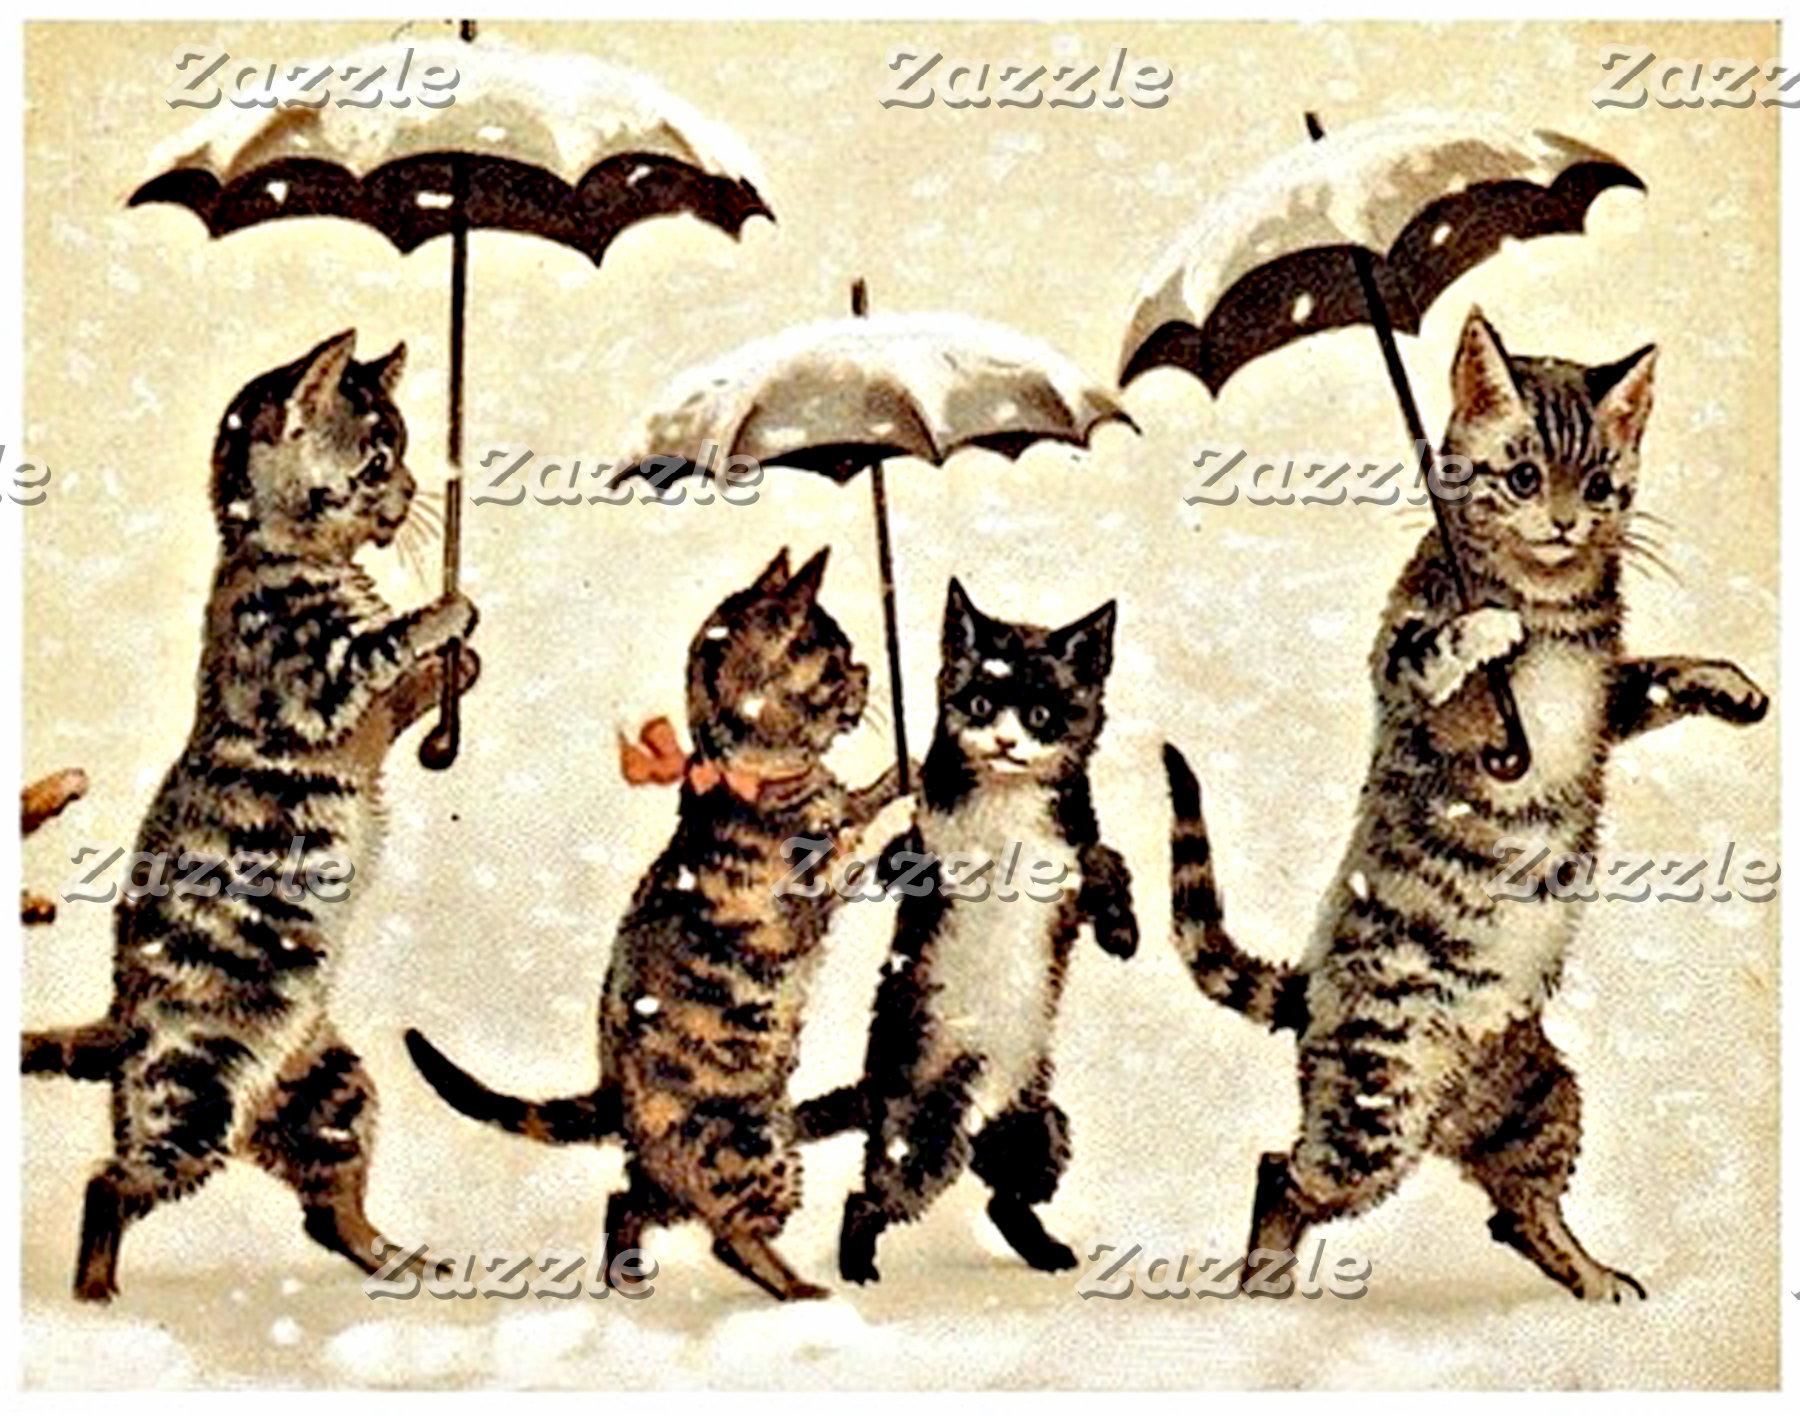 Cats With Umbrellas (Vintage Image)